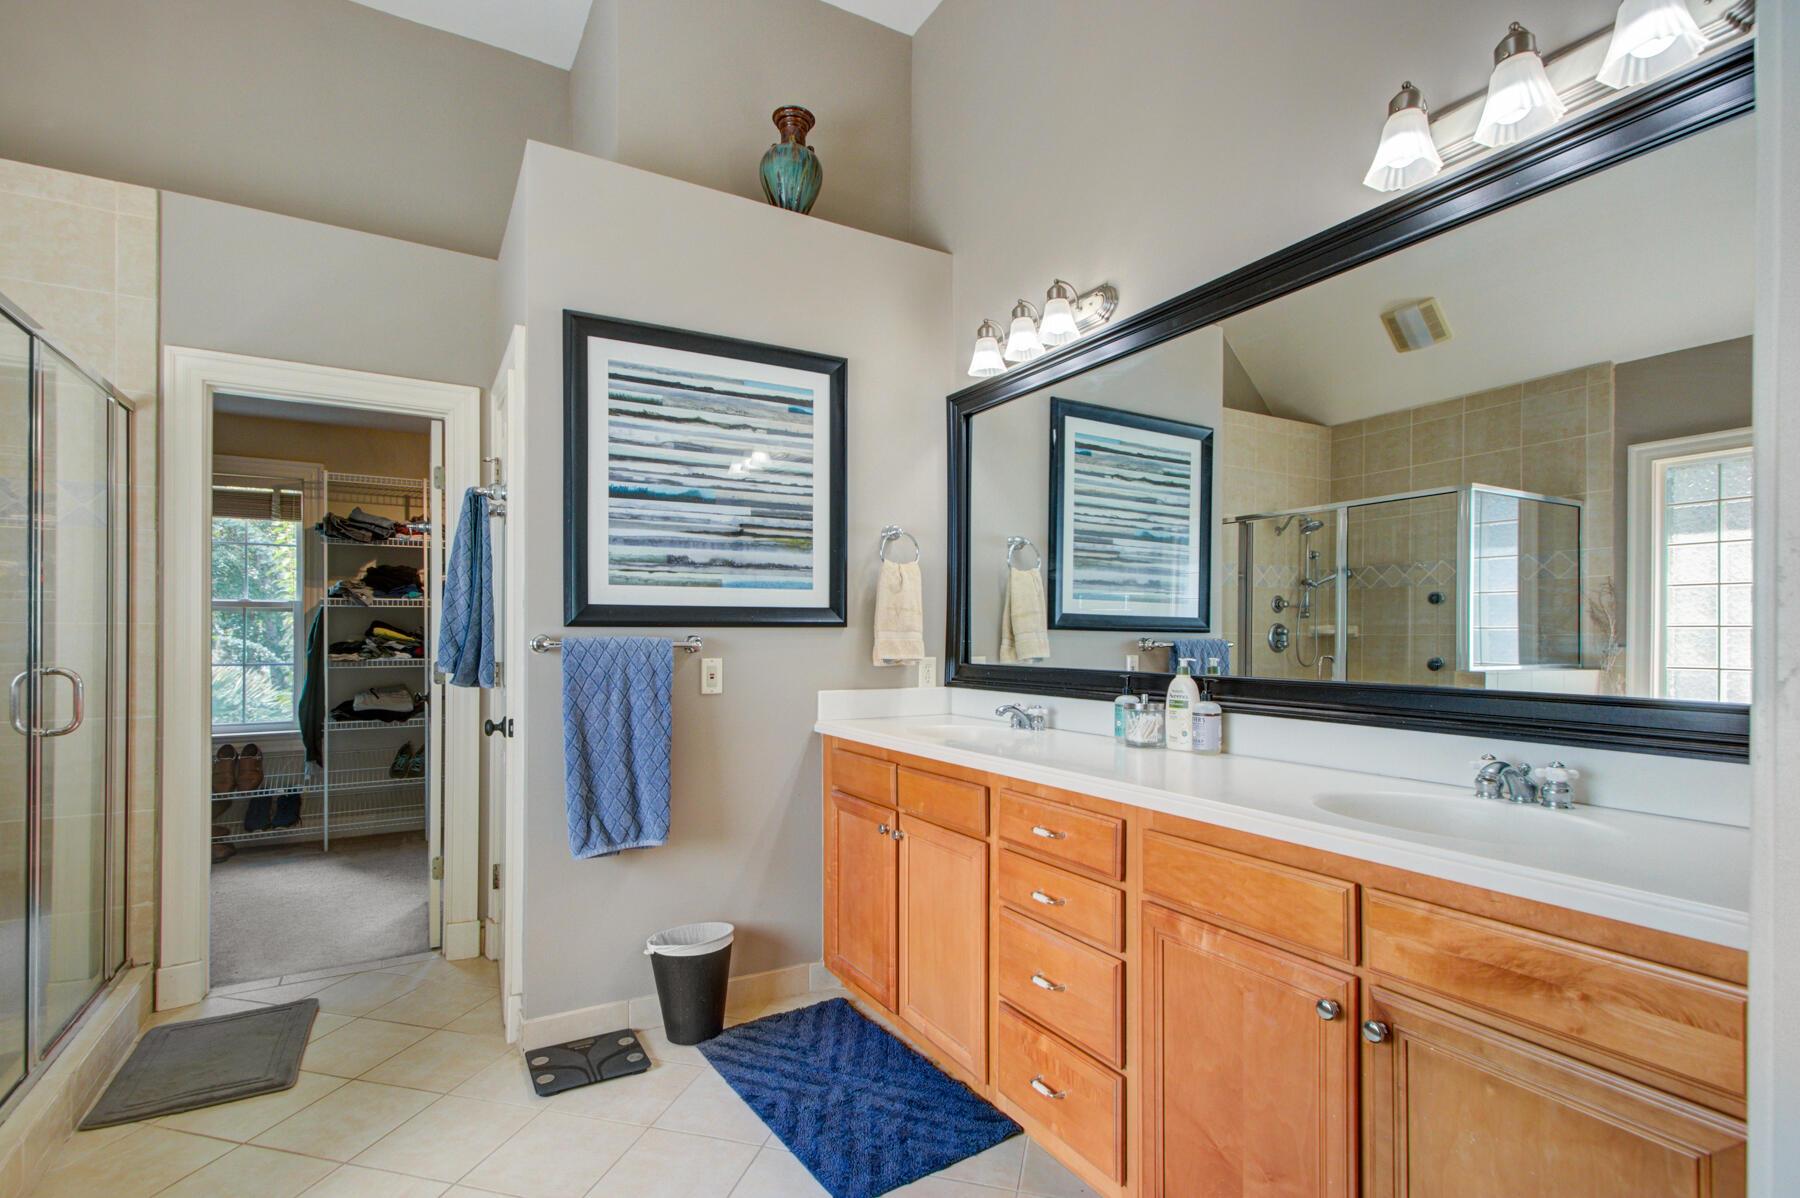 Dunes West Homes For Sale - 3095 Pignatelli, Mount Pleasant, SC - 37